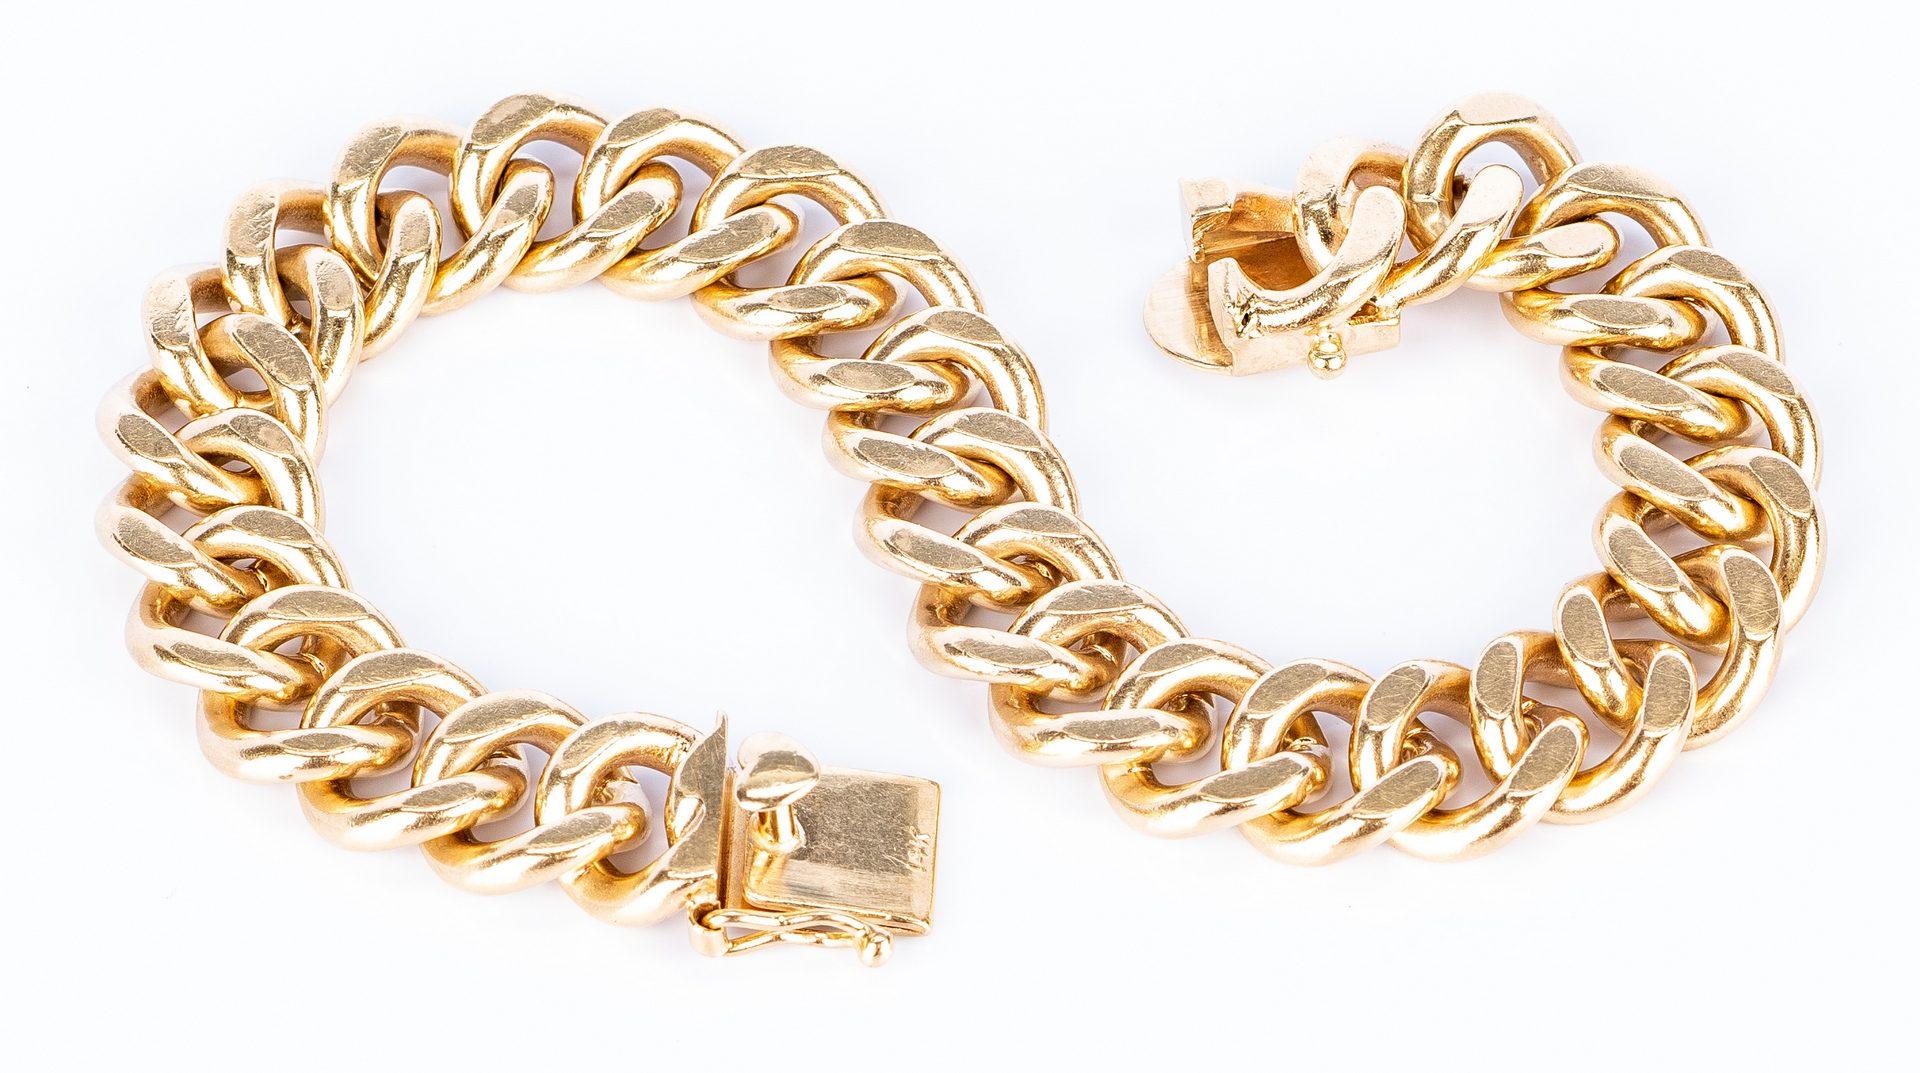 Lot 185: 14K Heavy Link Bracelet, 51 grams